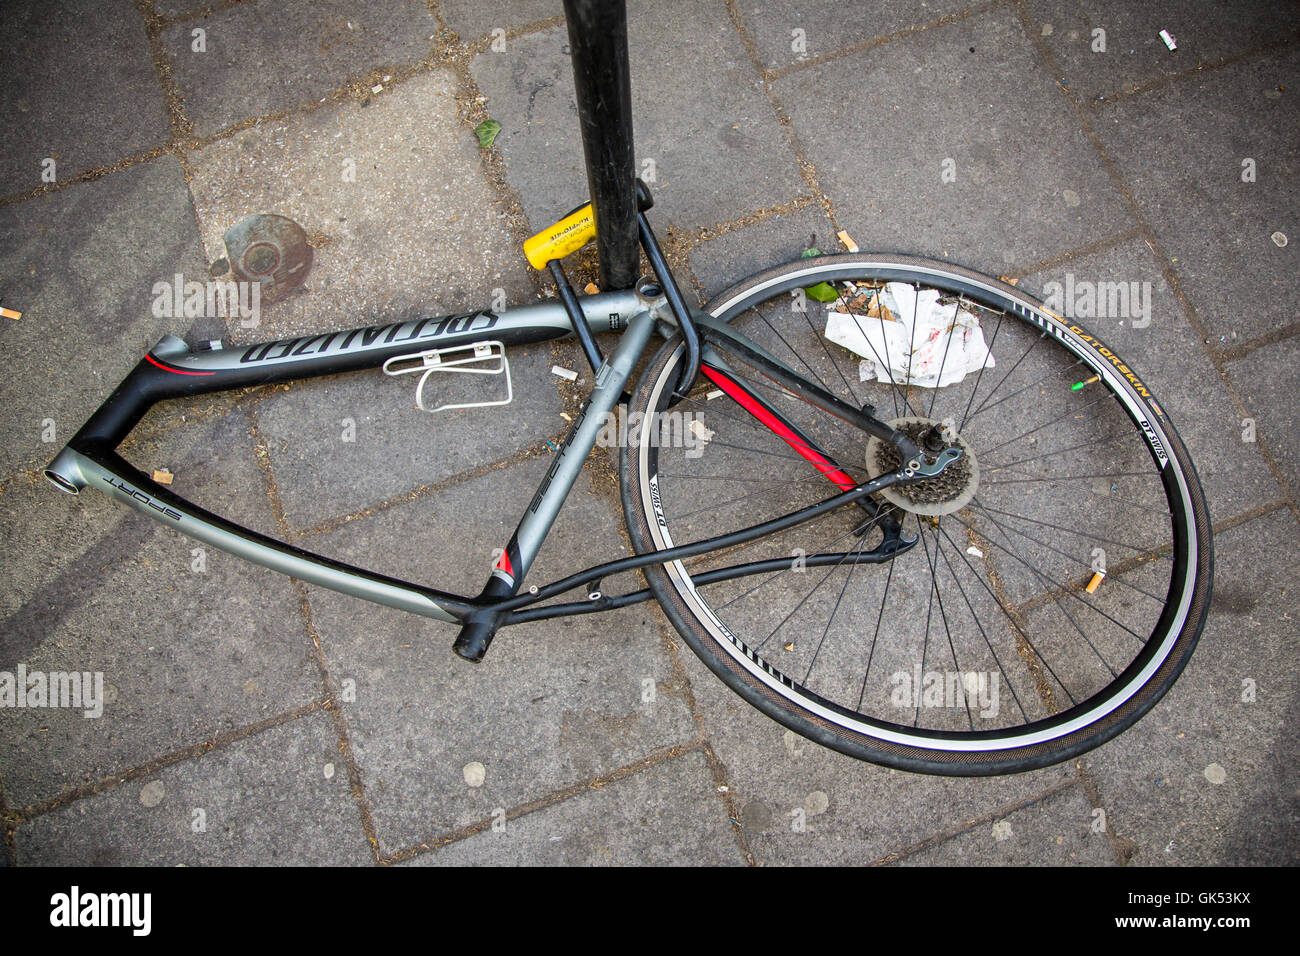 Bike Broken Frame Stockfotos & Bike Broken Frame Bilder - Alamy